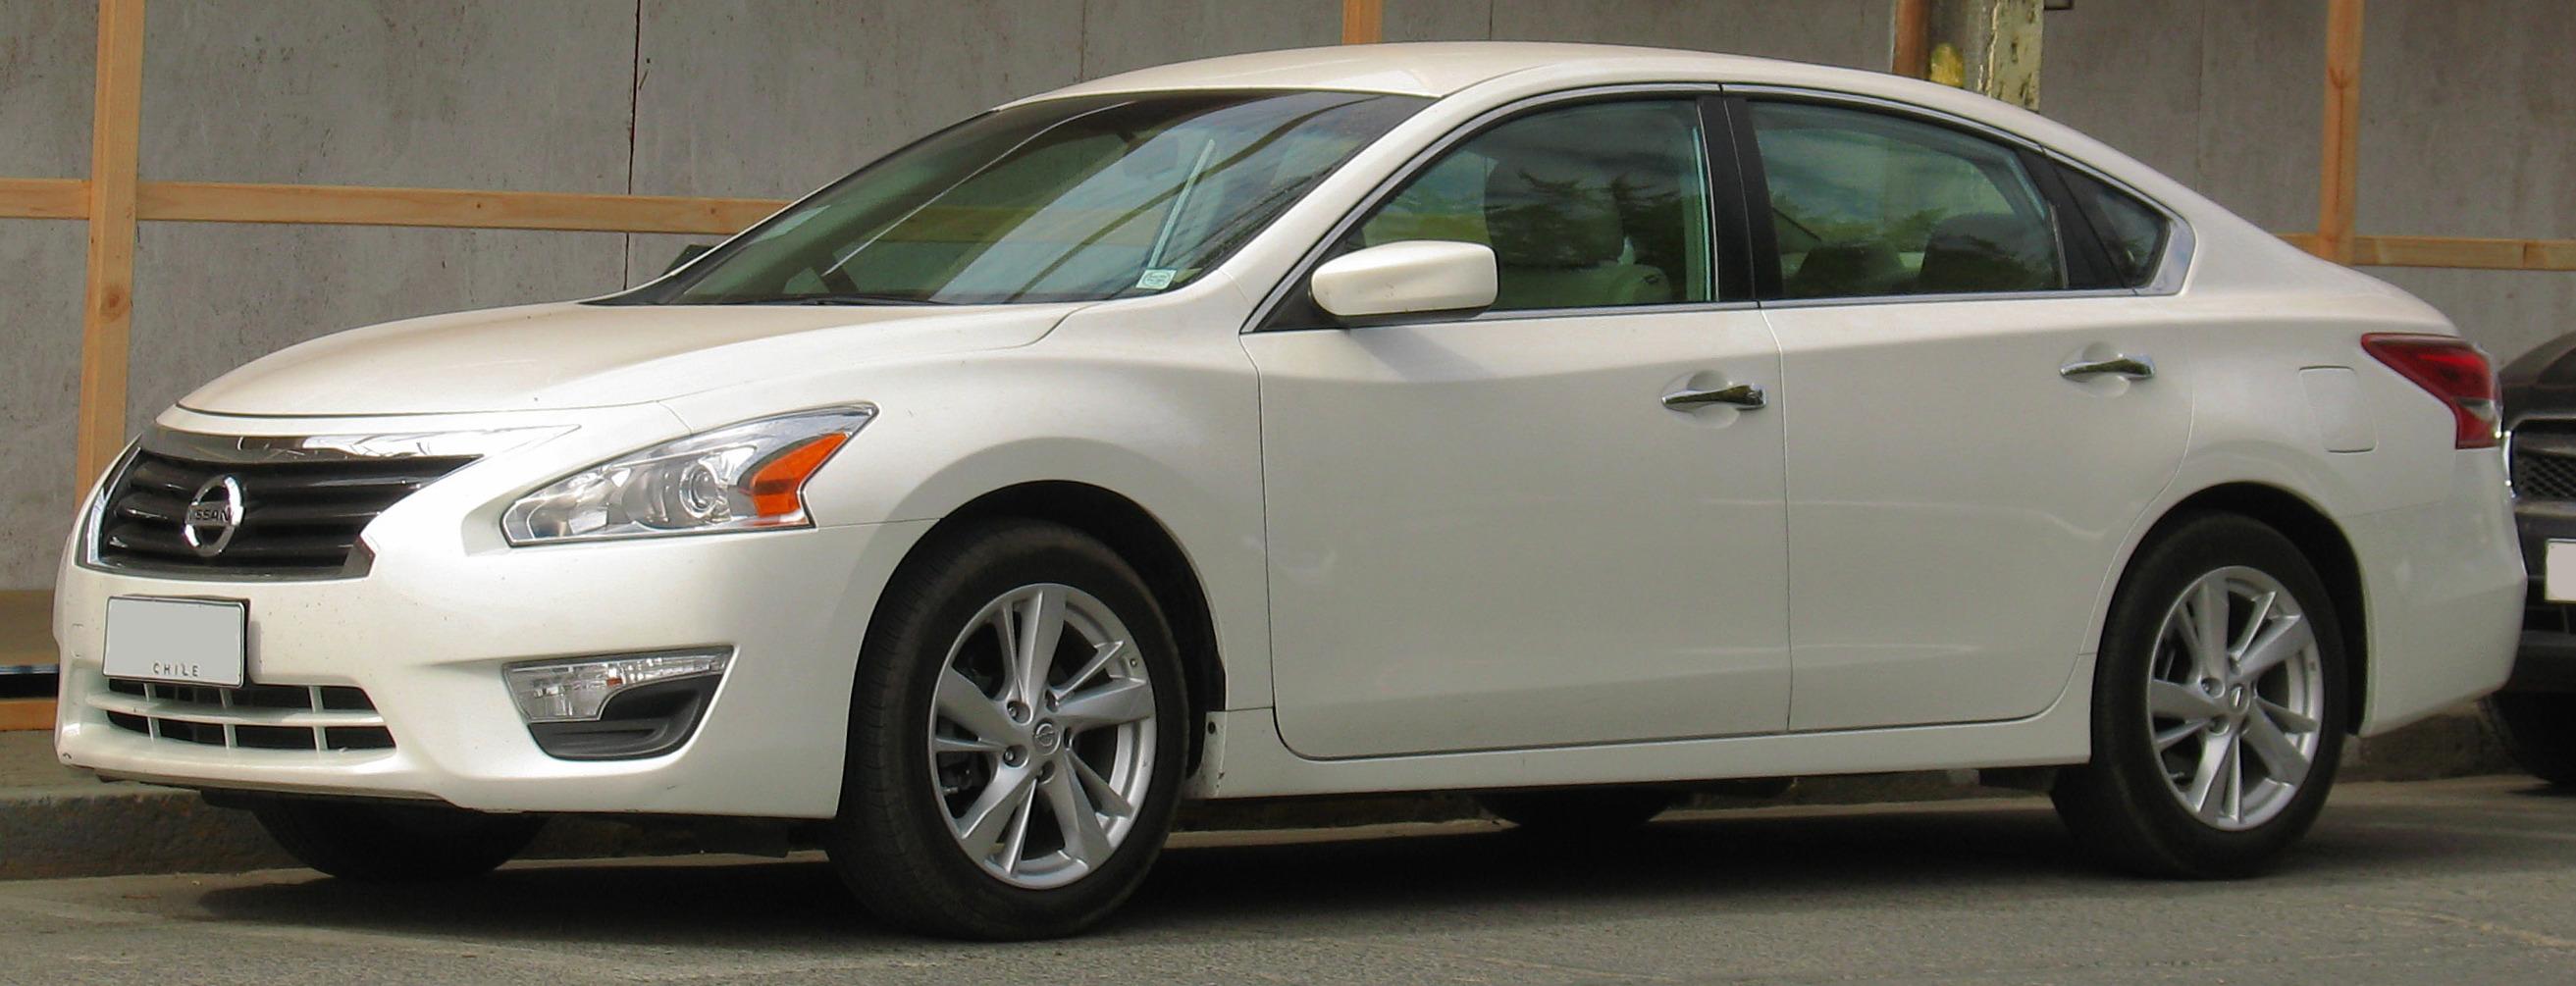 File:Nissan Altima 2.5 SV 2013 (14253554427)